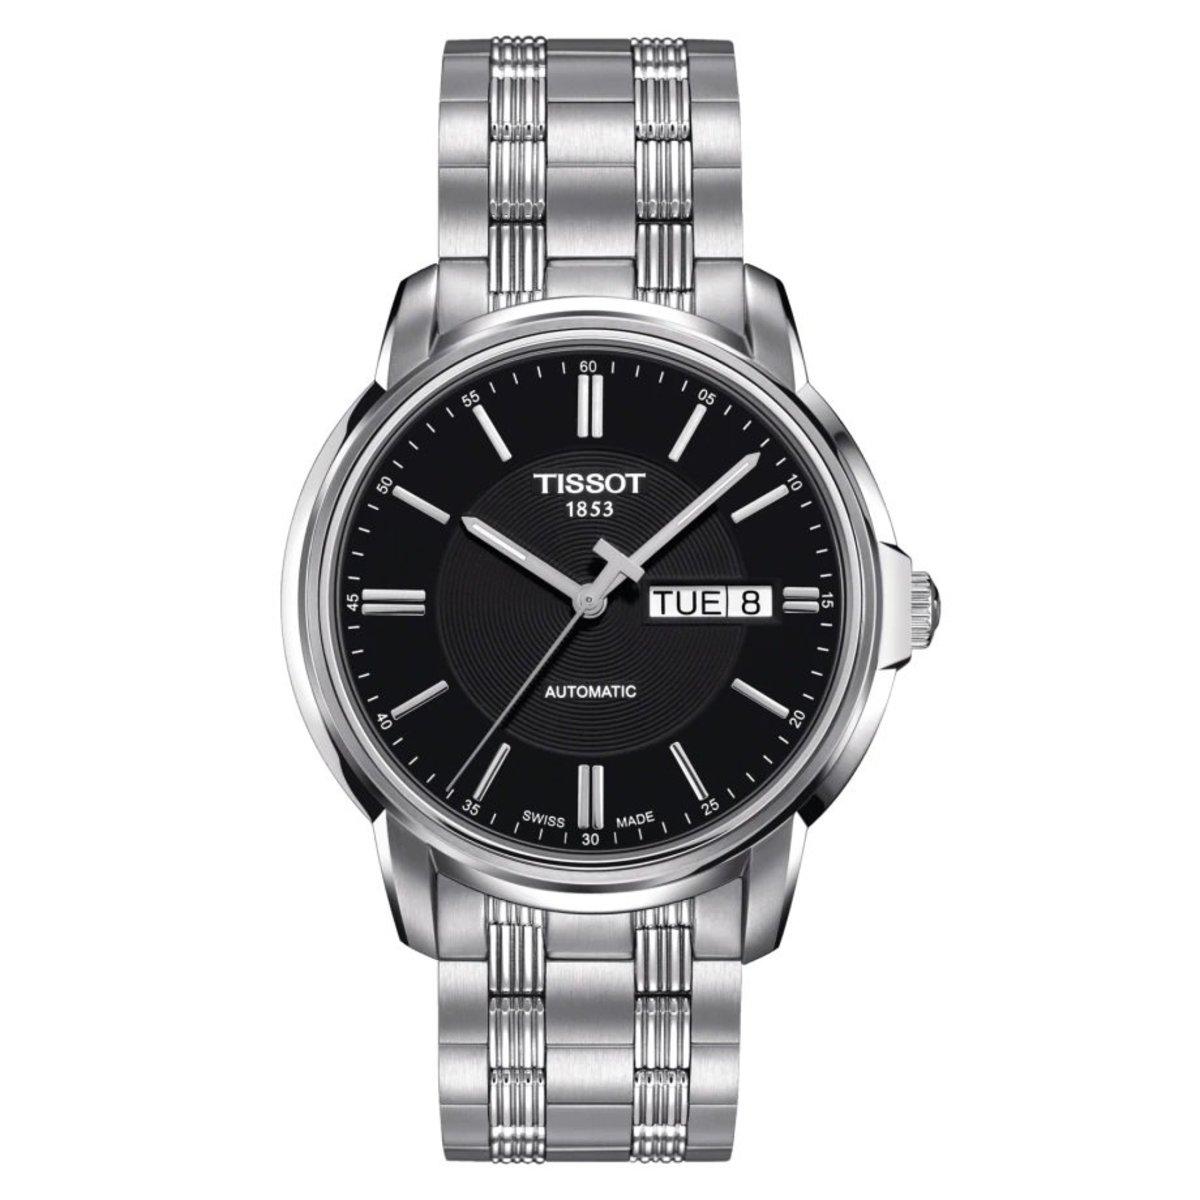 TISSOT T-Class Automatics III Men's Steel Watch - Black (parallel goods)